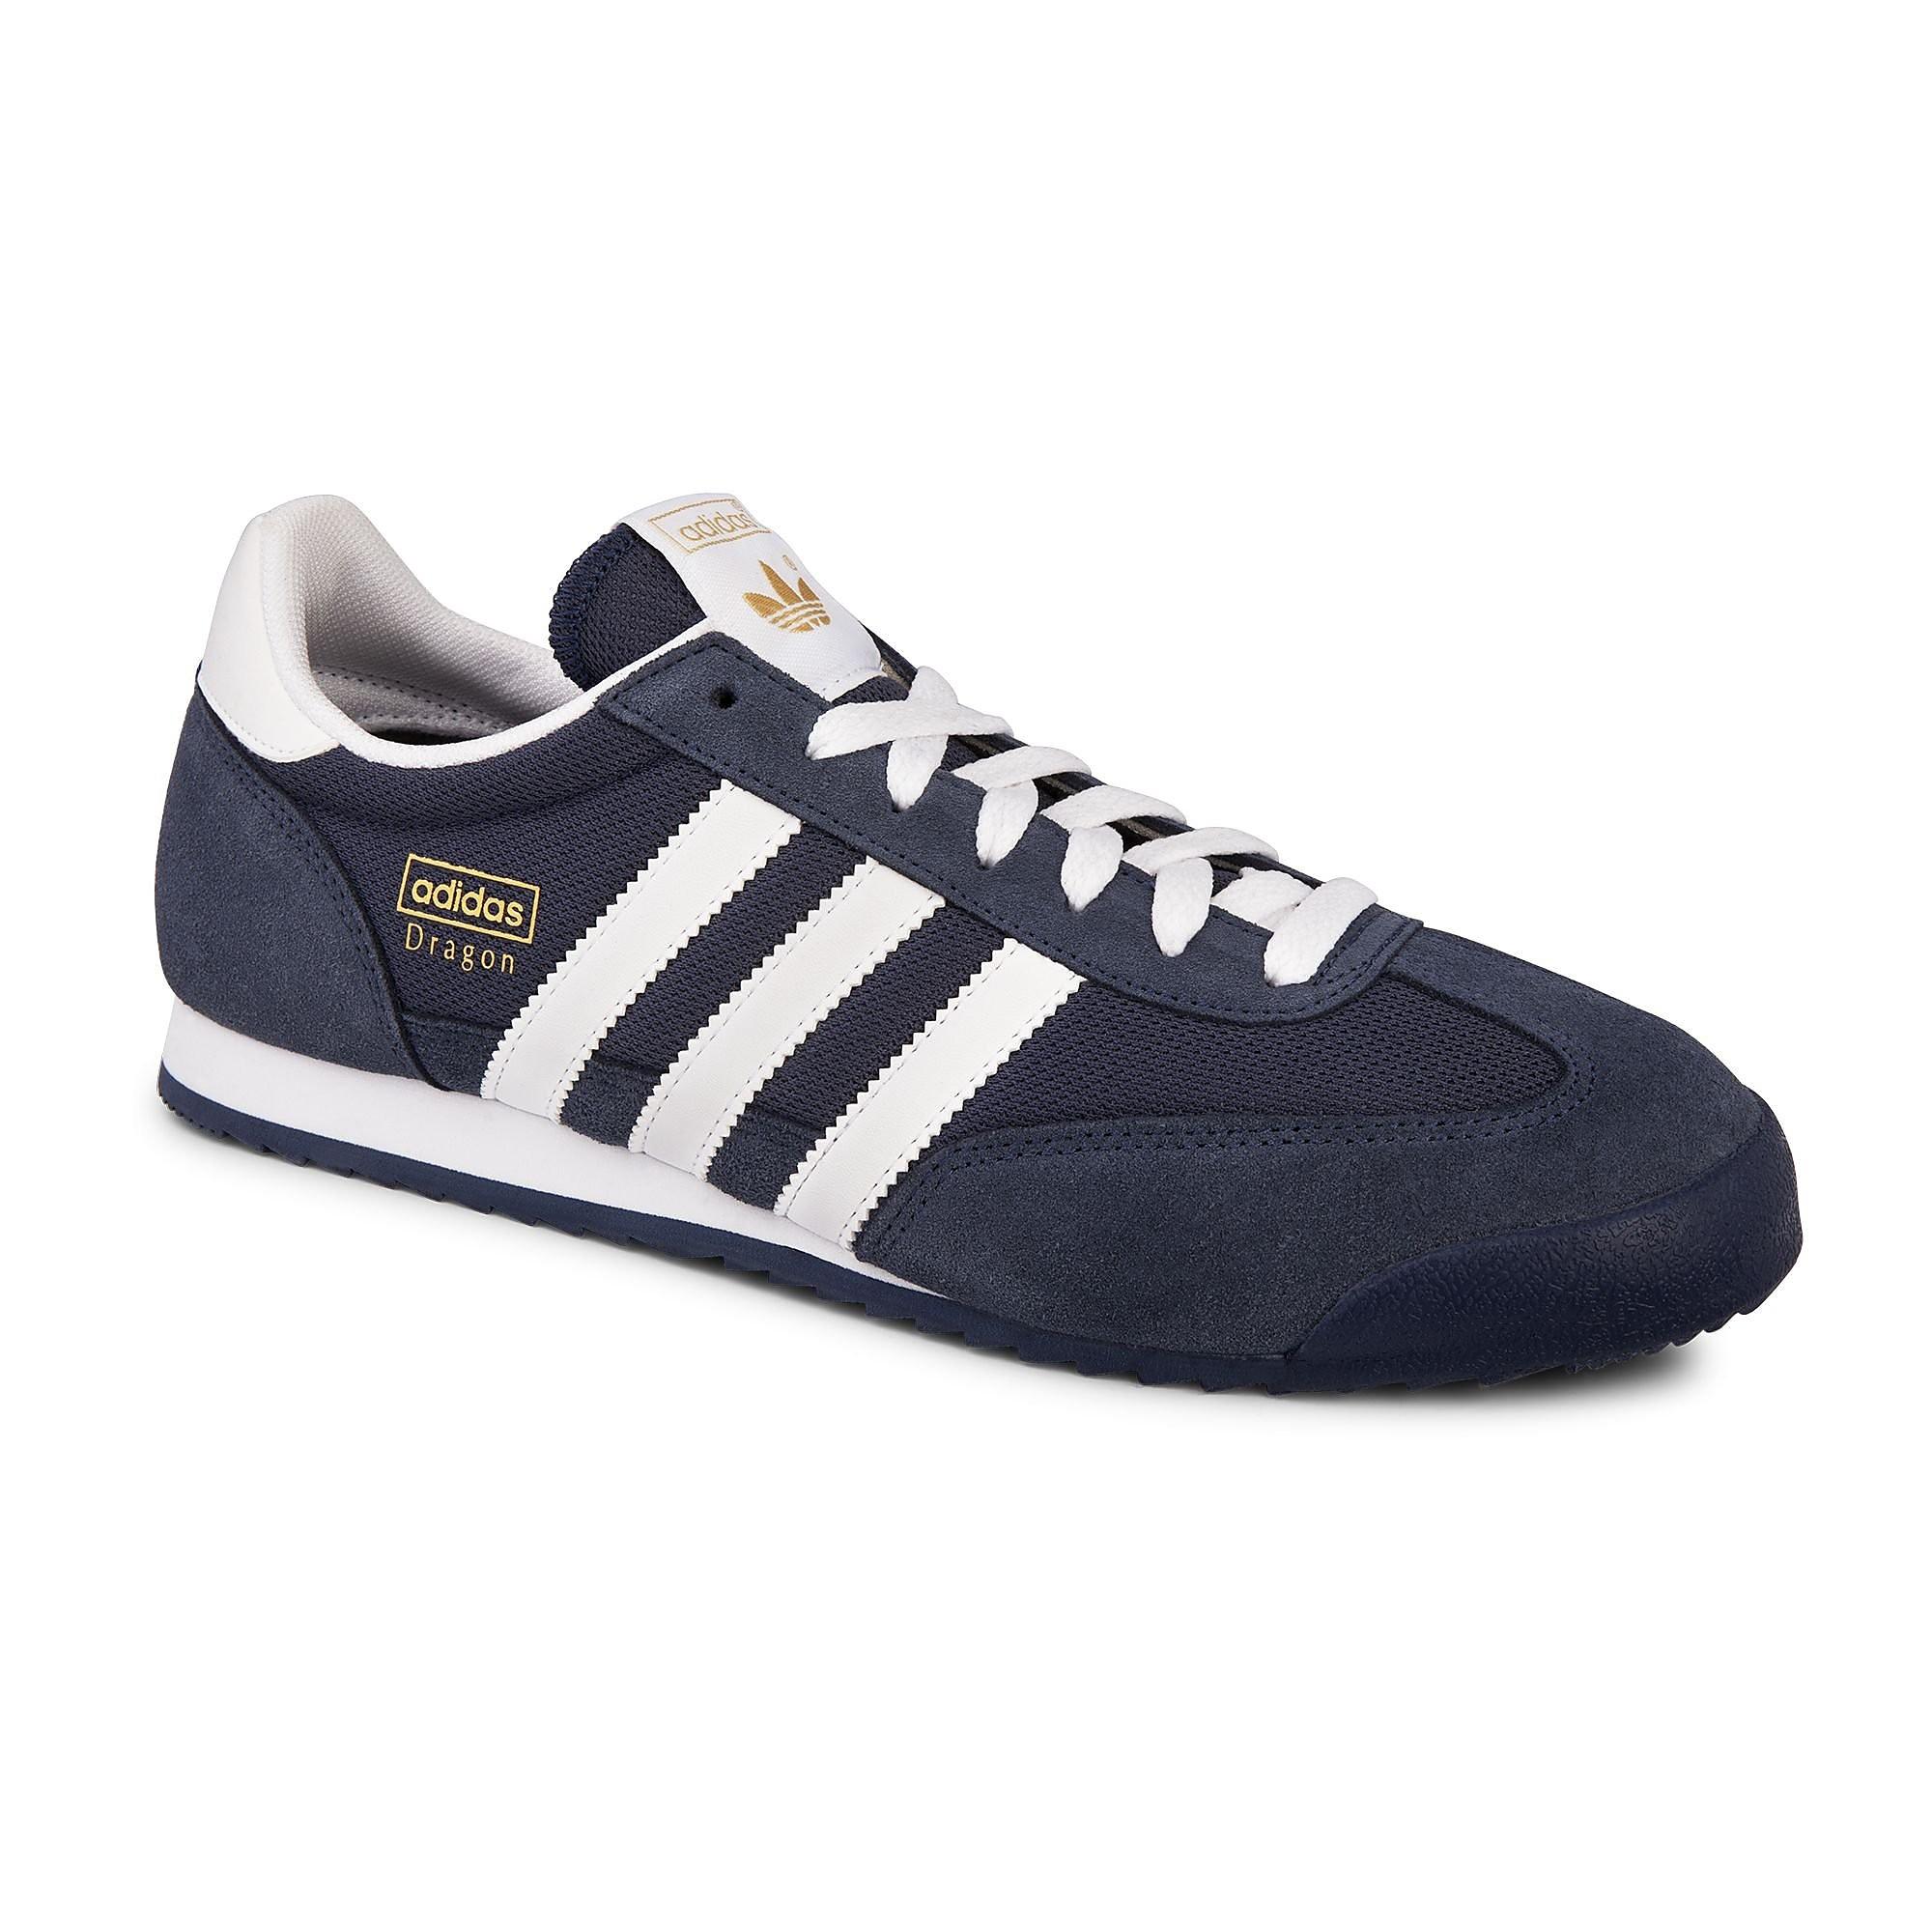 sneakers adidas DRAGON-40 2-3 7.5